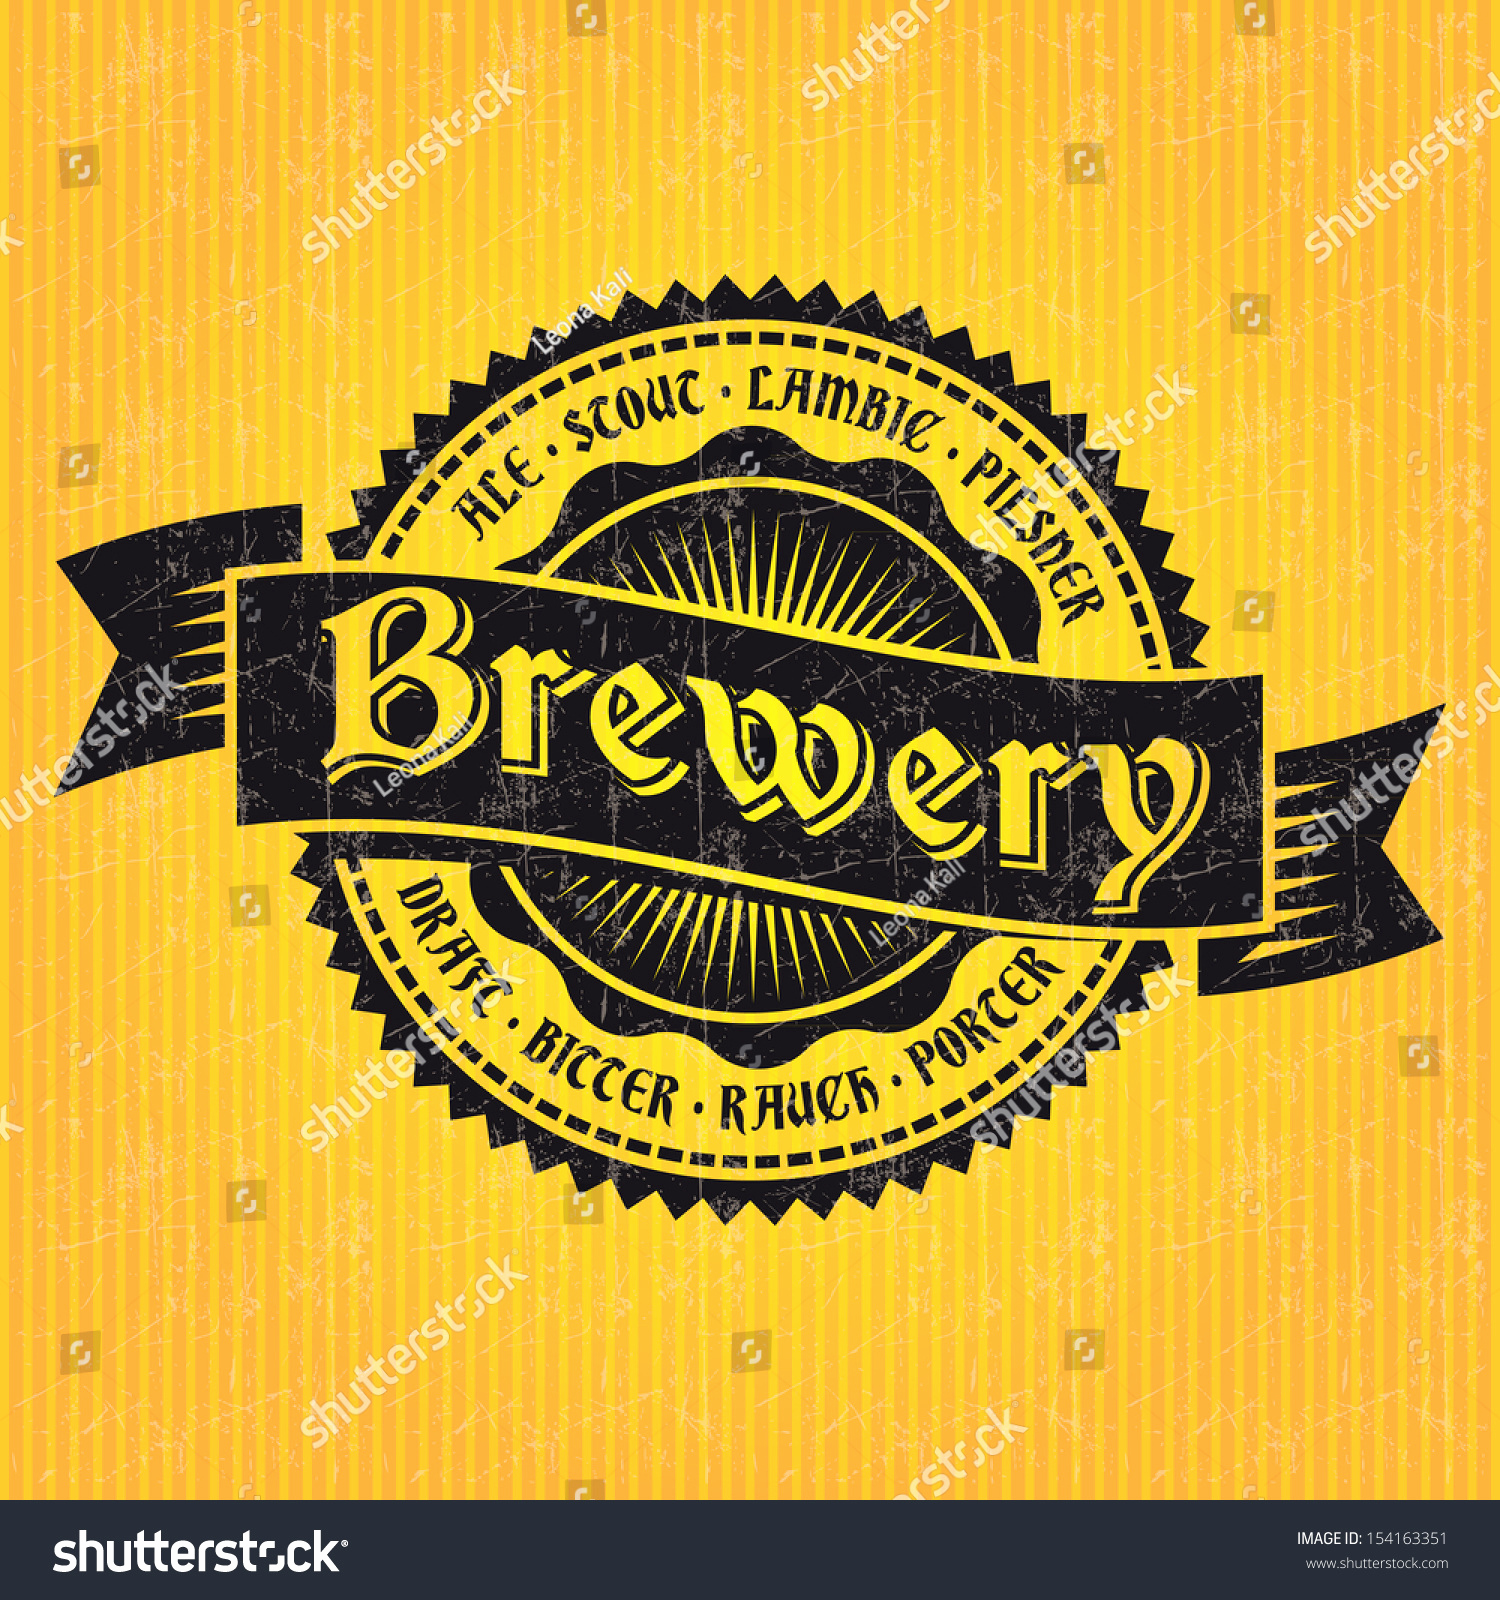 Beer Label Design Template Luxury Beer Label Design Template Stock Vector Illustration